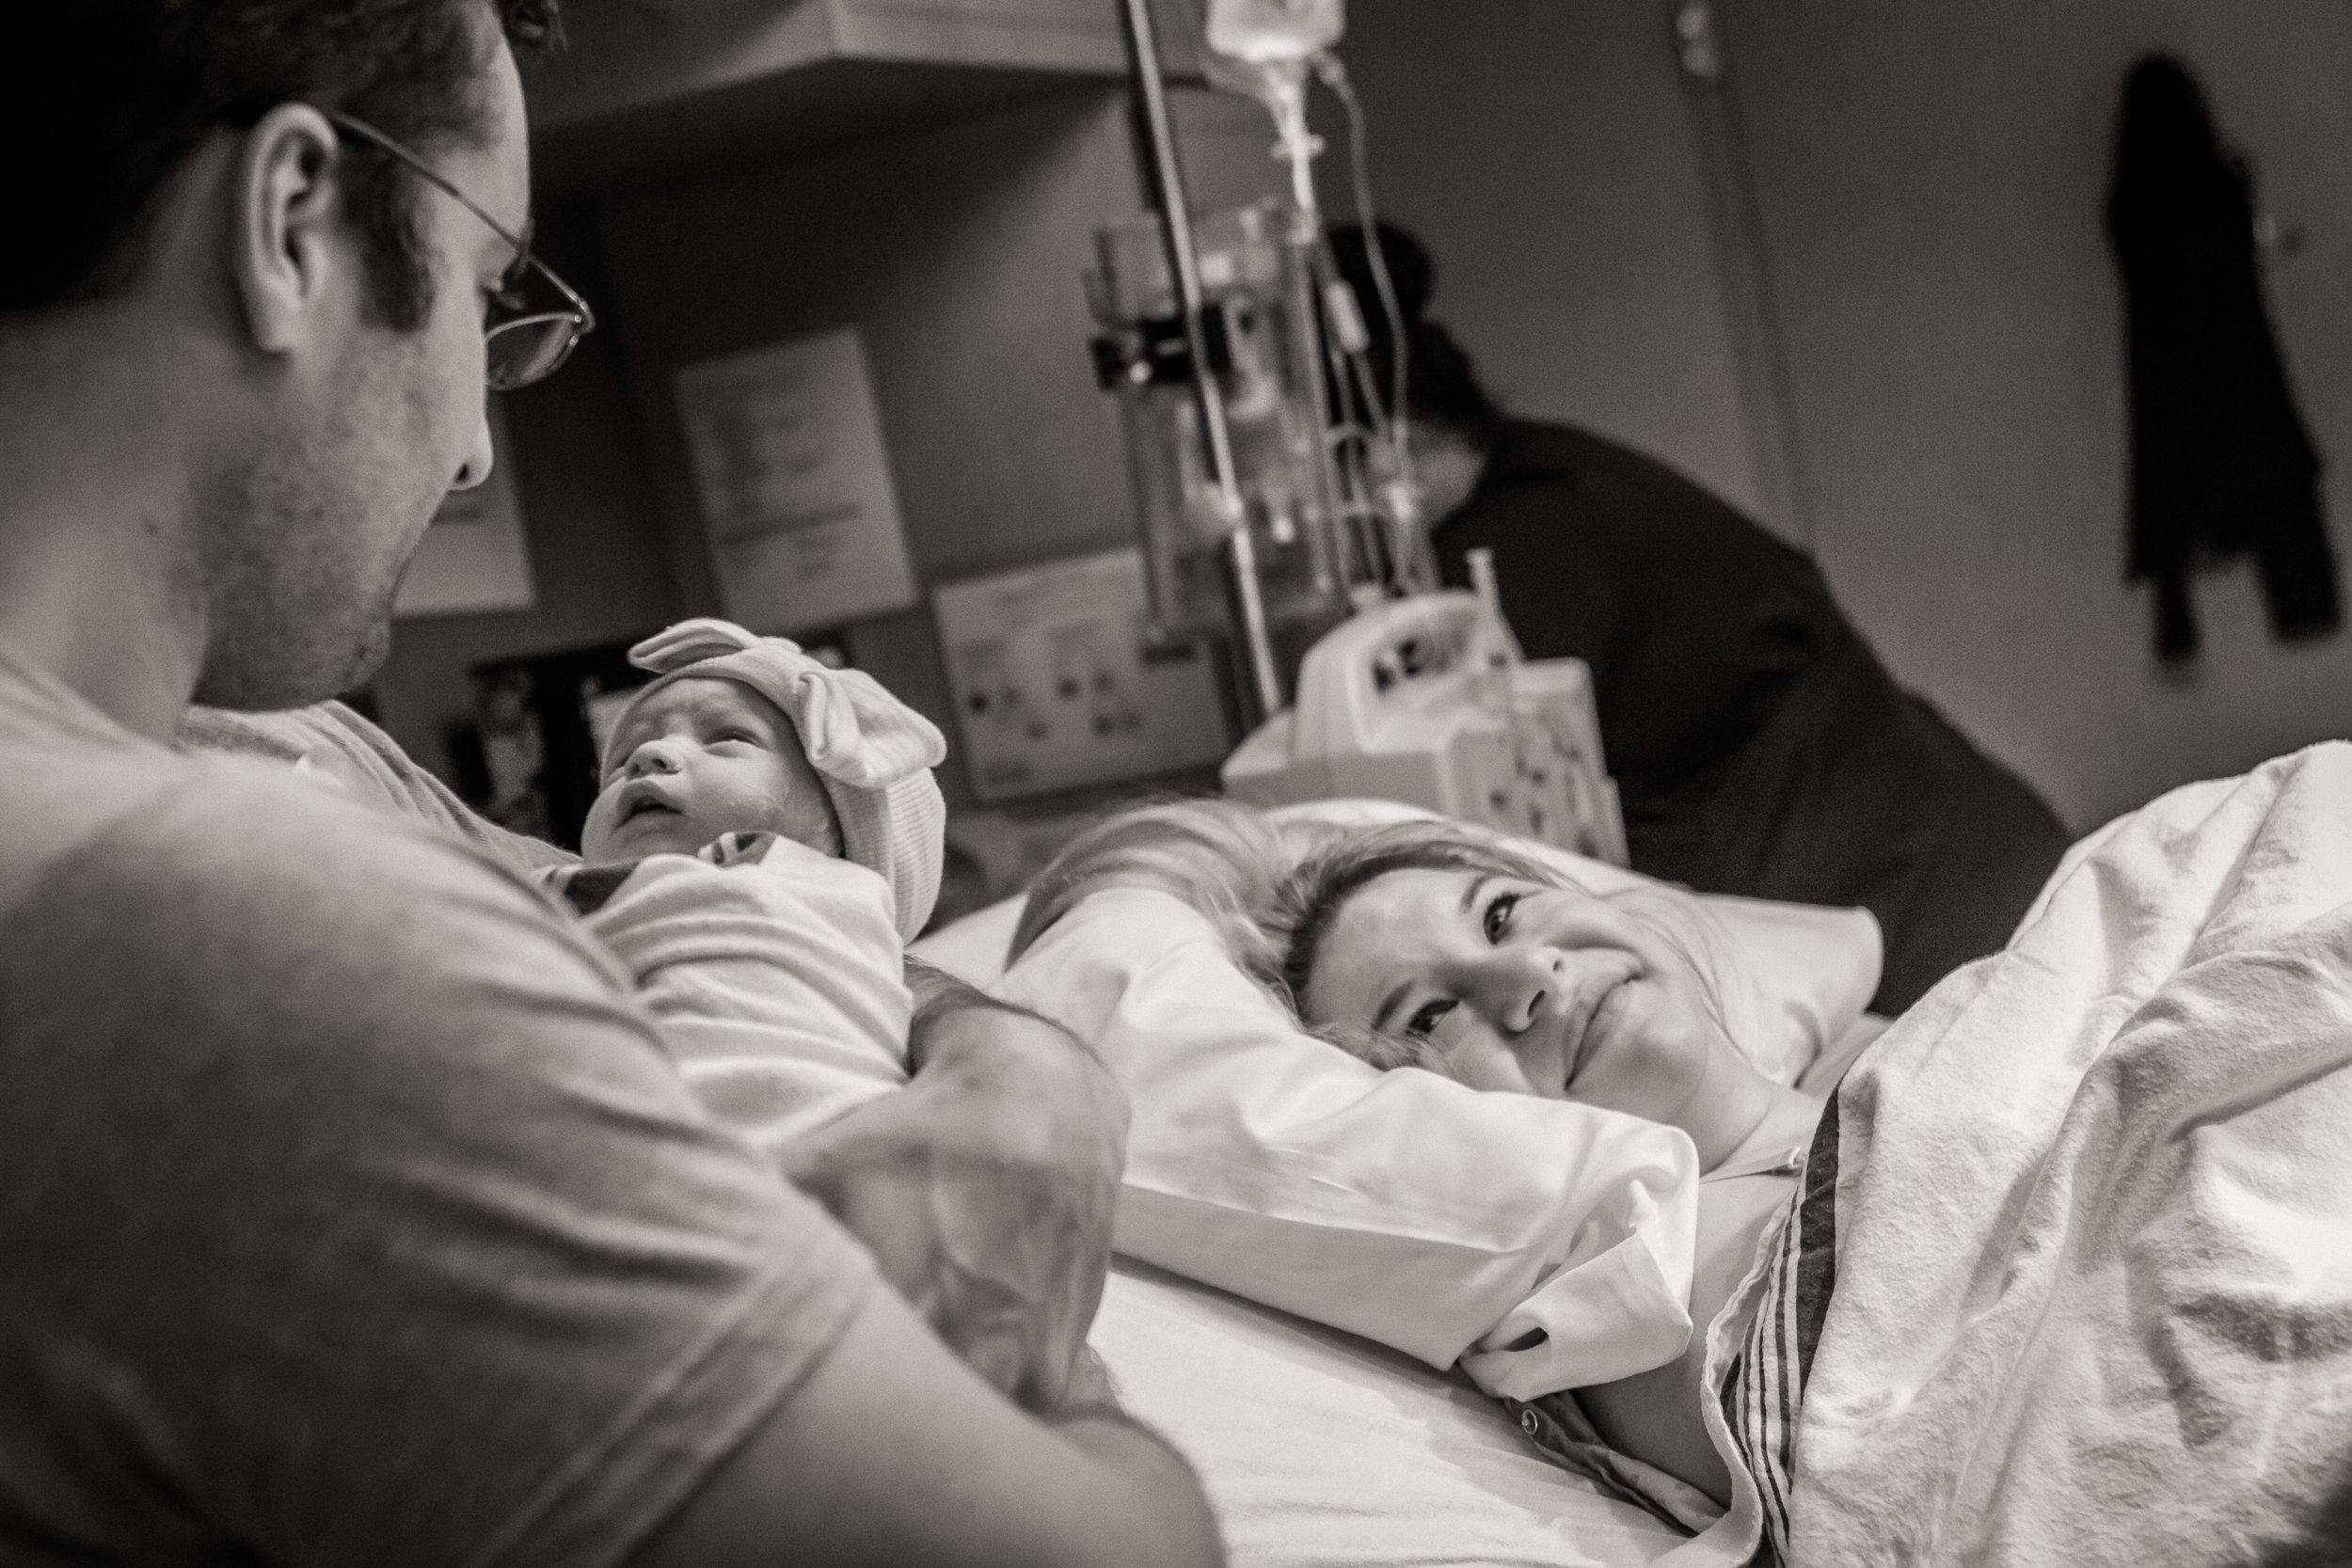 ripley-oklahoma-hsoiptal-birth-story-photography.jpg